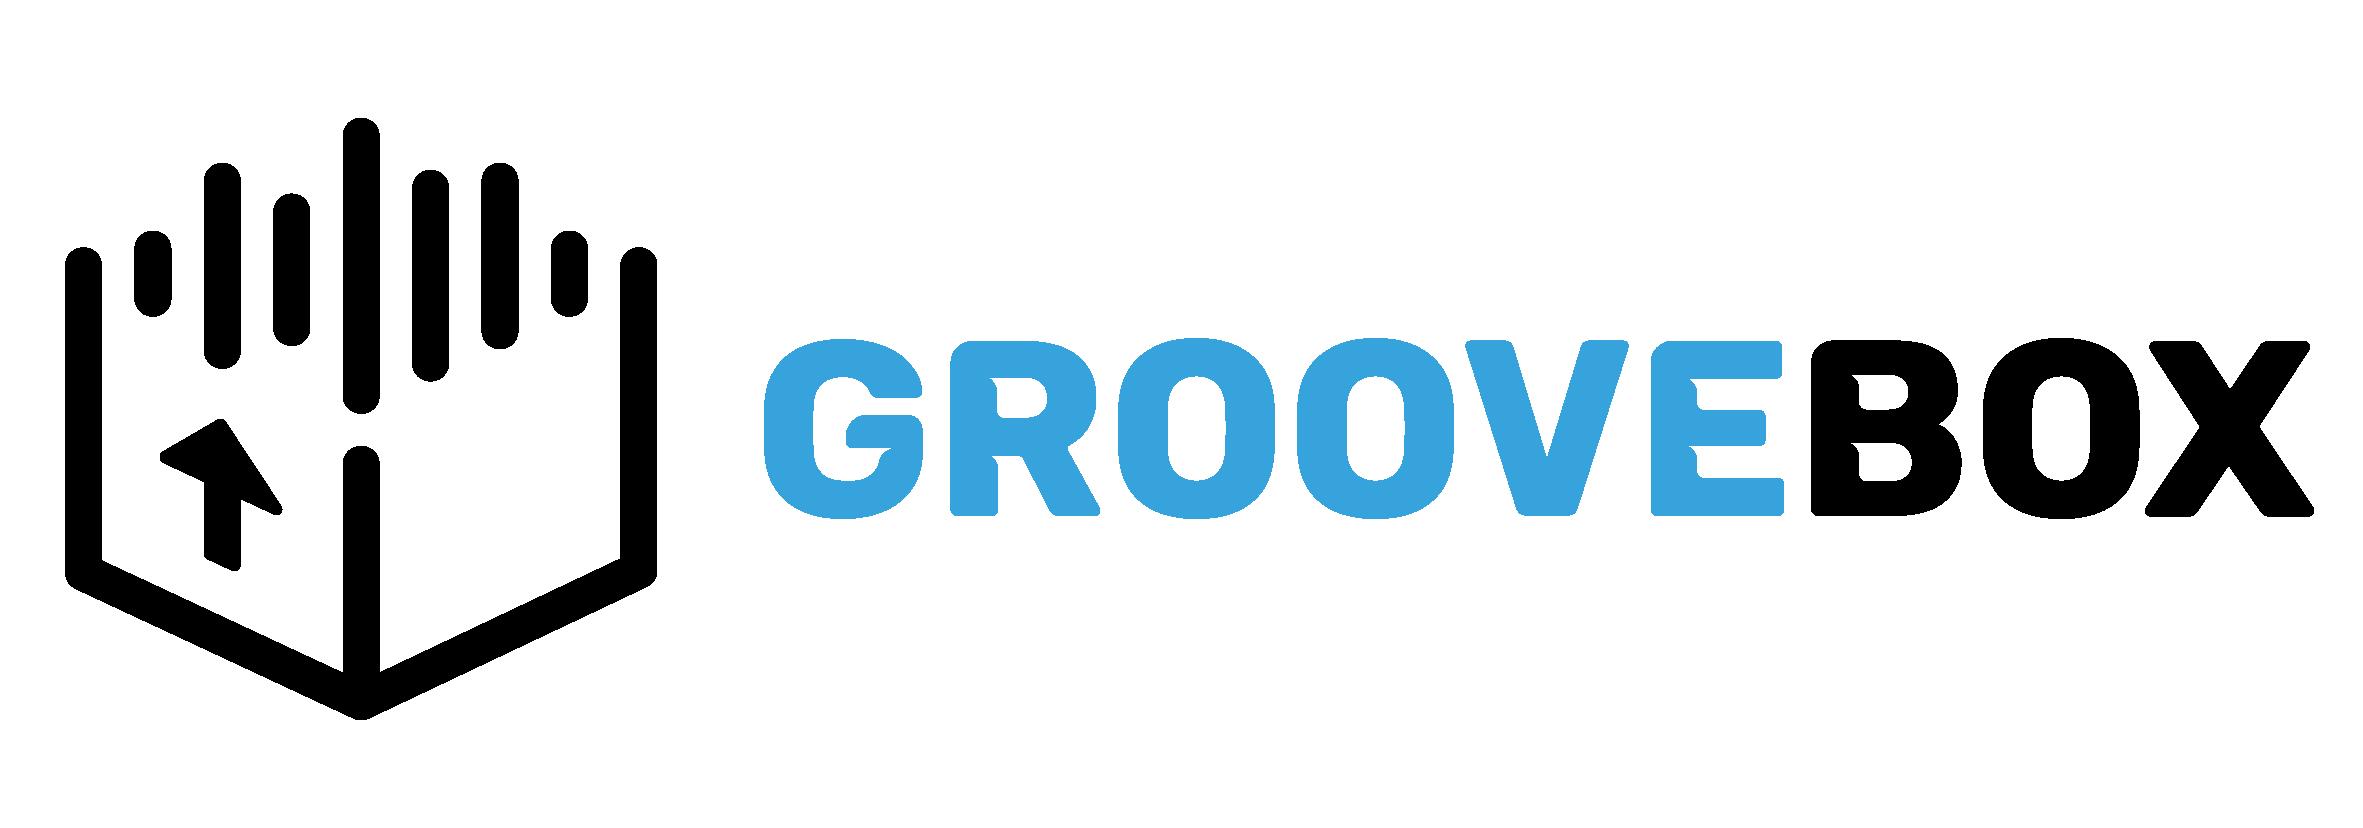 Groovebox logo